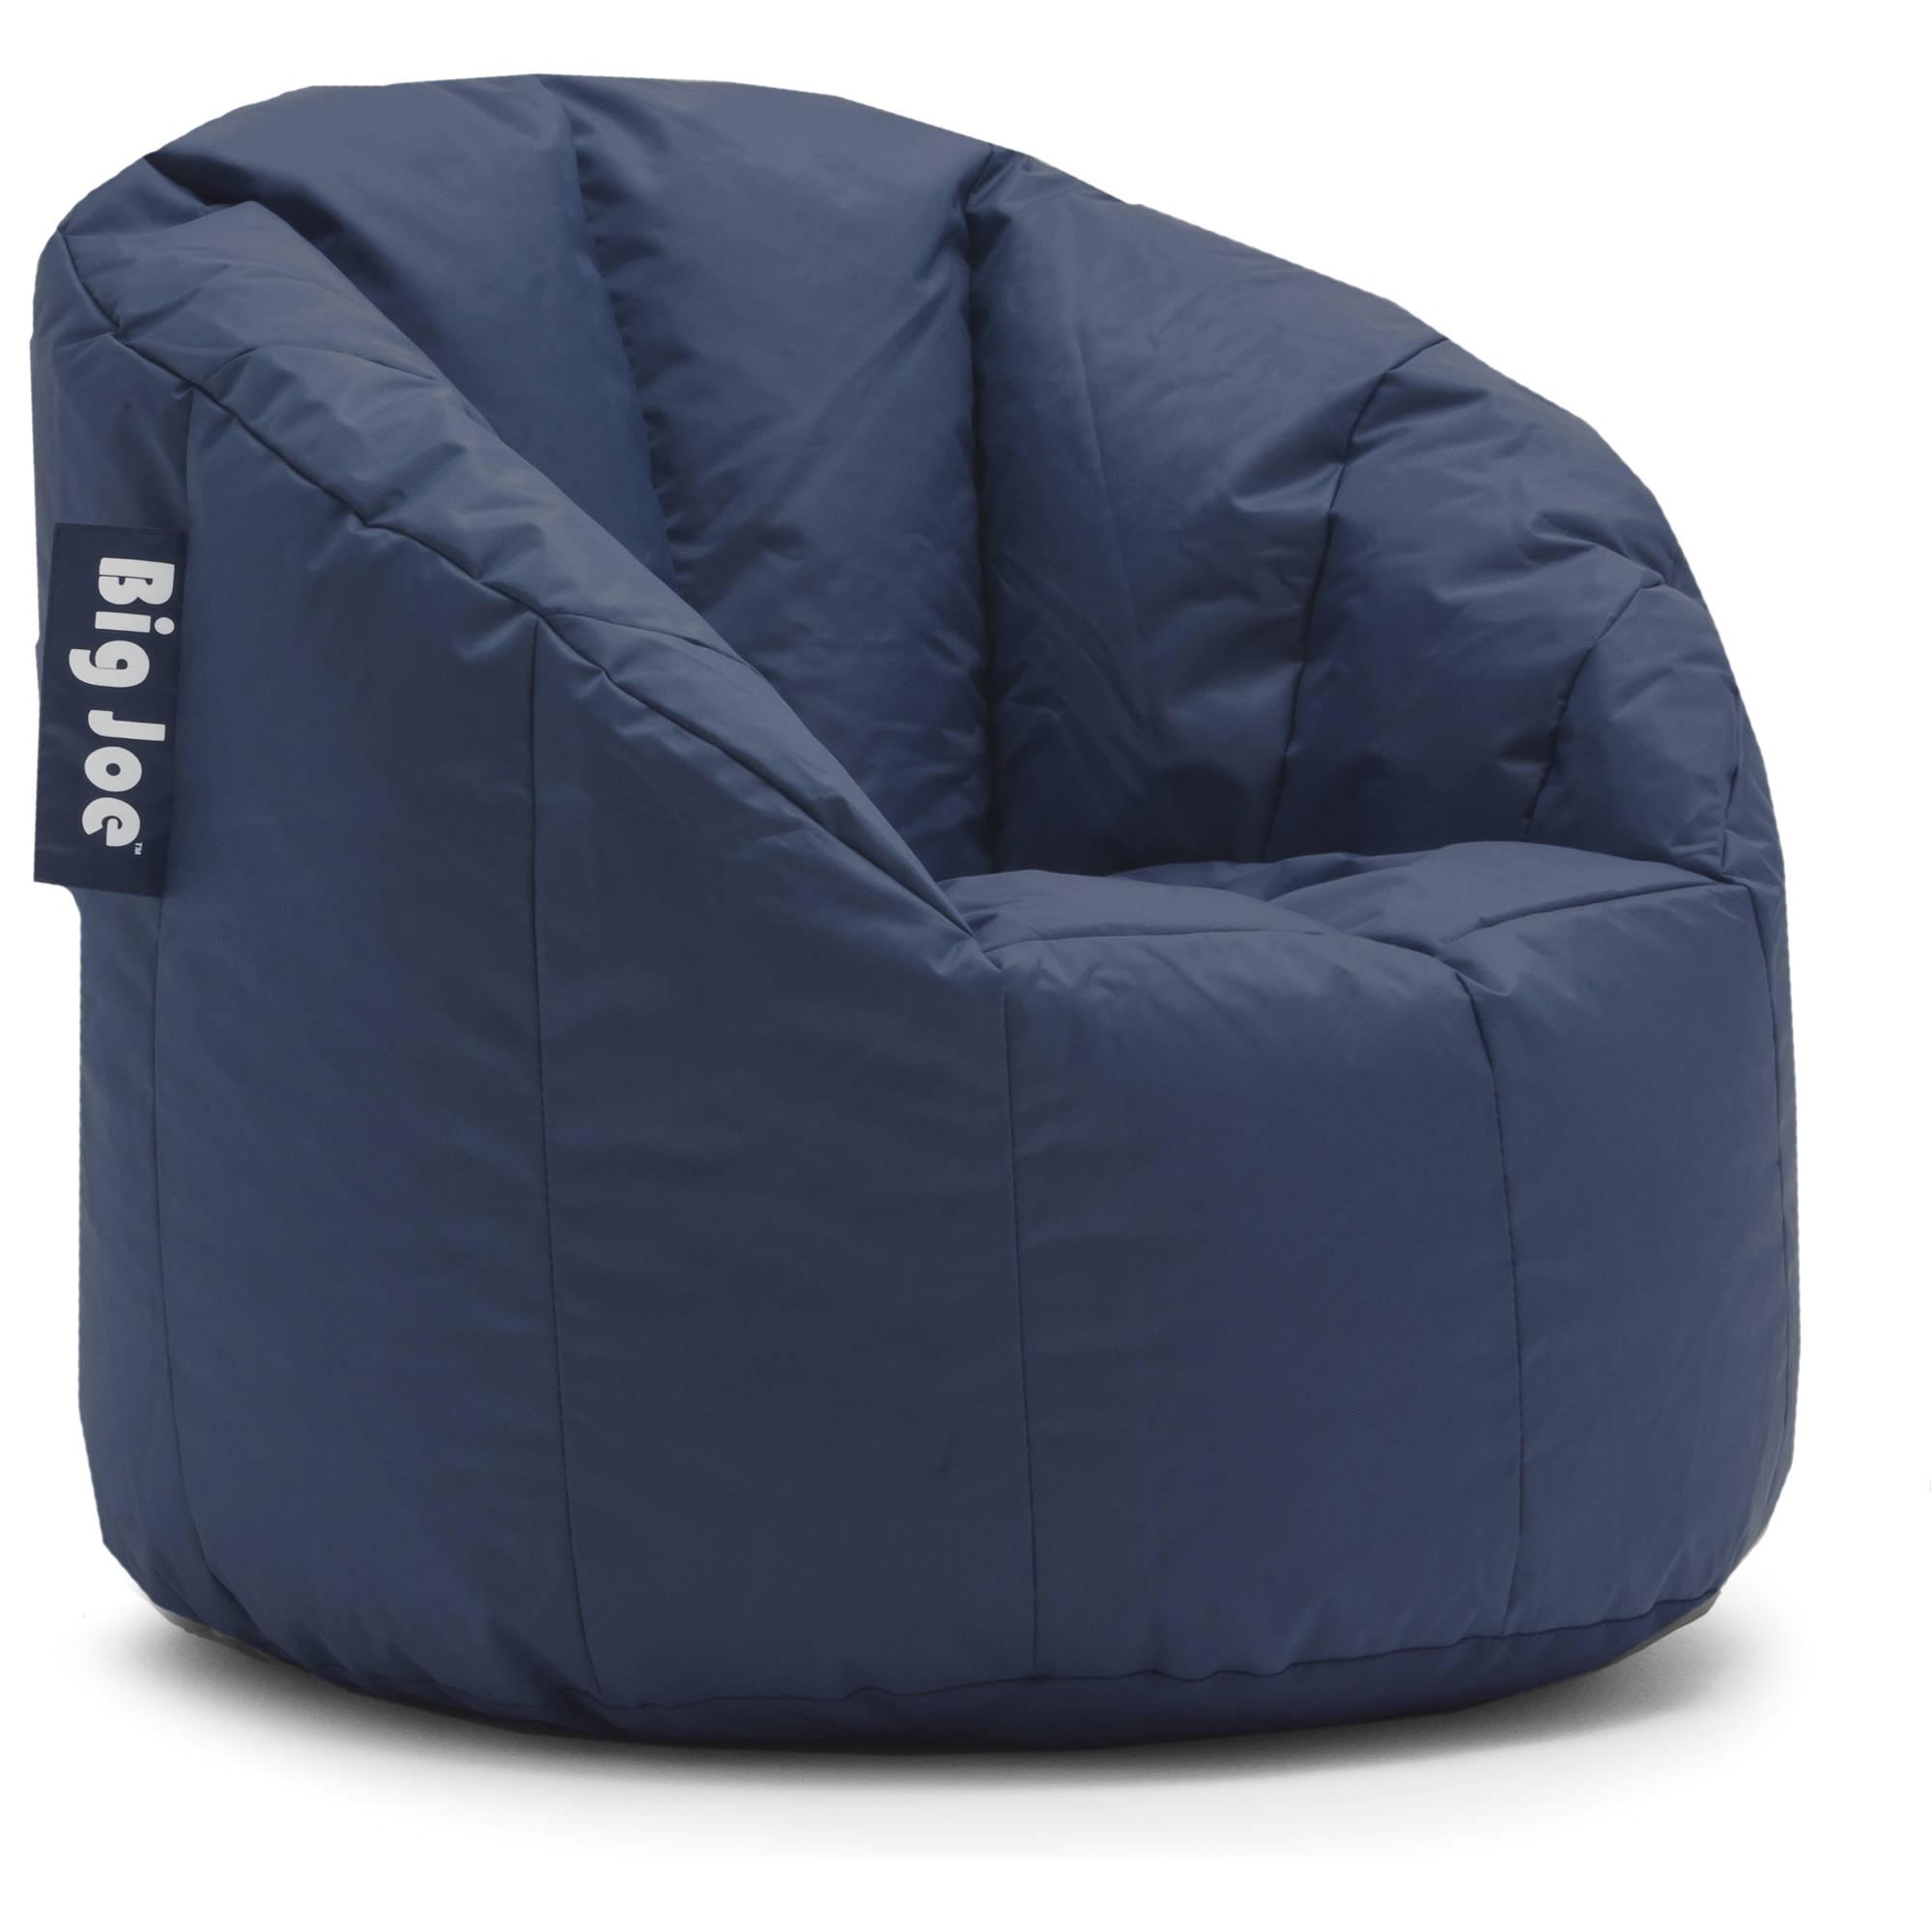 Big Joe Chairs at Walmart Big Joe Milano Bean Bag Chair Multiple Colors 32 X 28 X 25